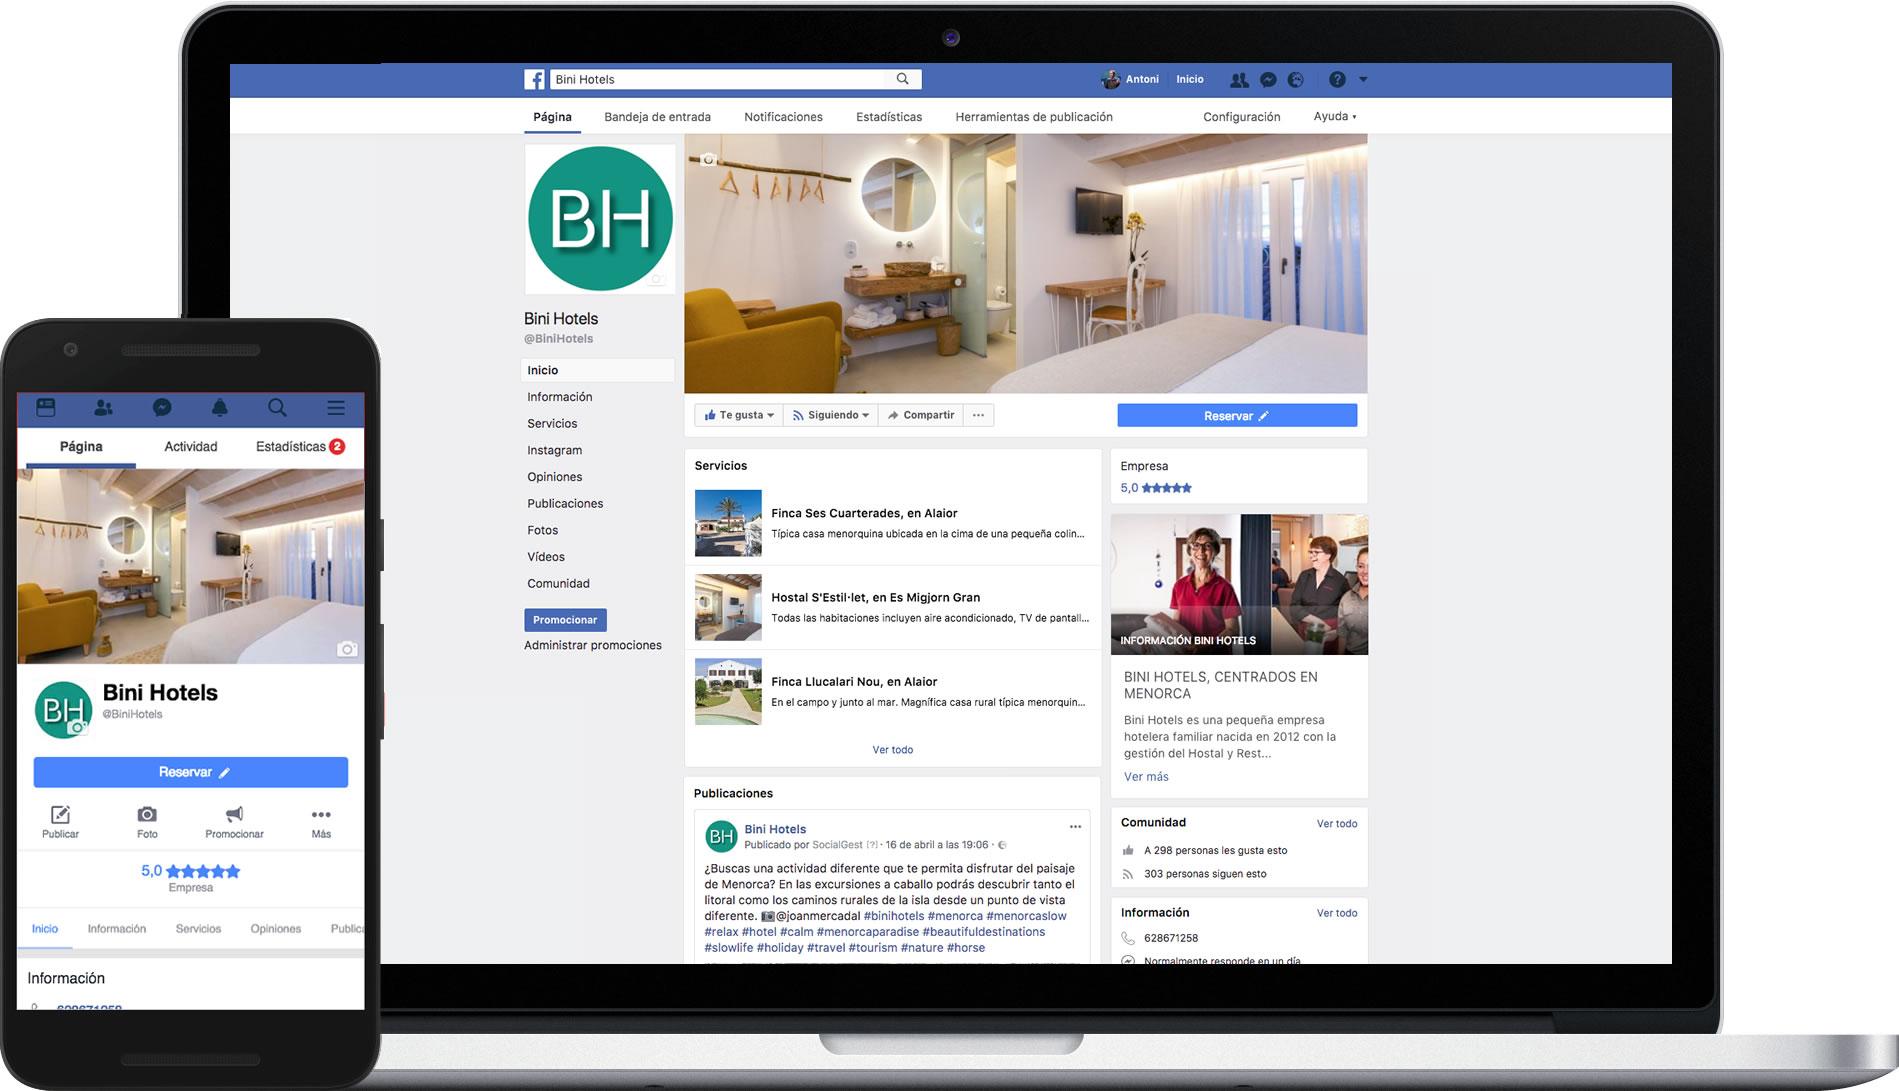 Facebook de Binihotels Menorca